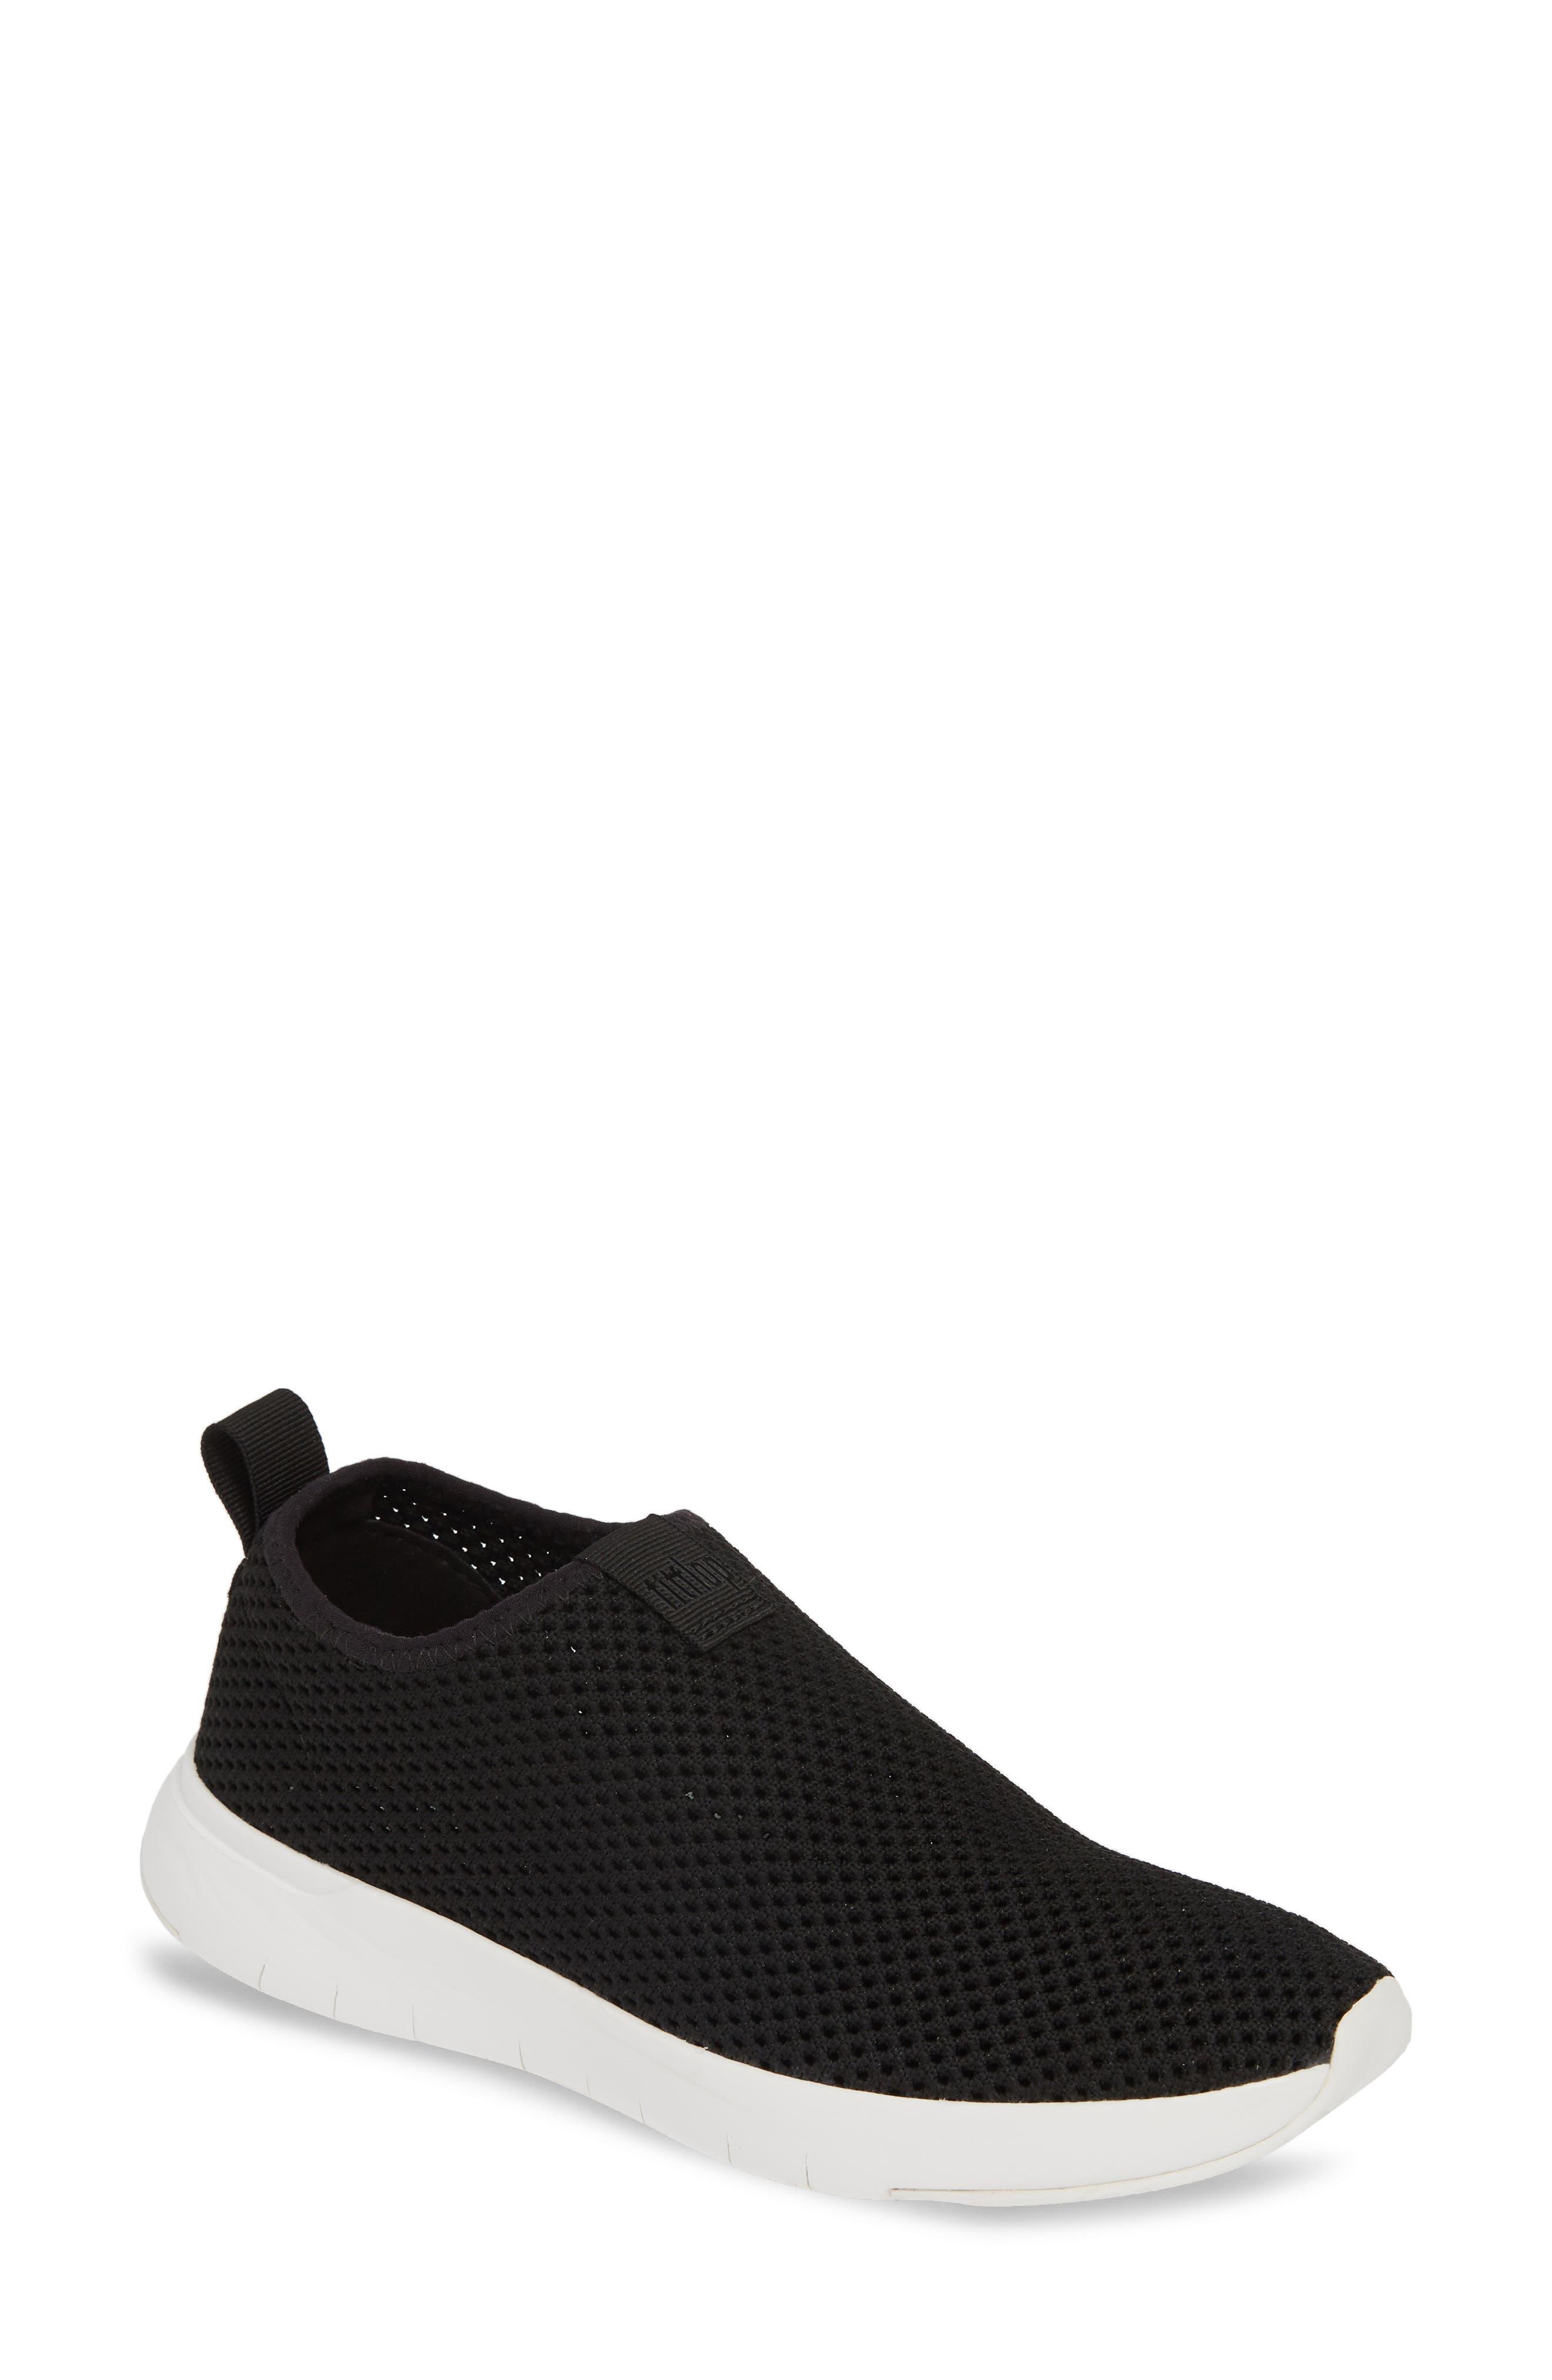 FITFLOP, Airmesh Slip-On Sneaker, Main thumbnail 1, color, BLACK